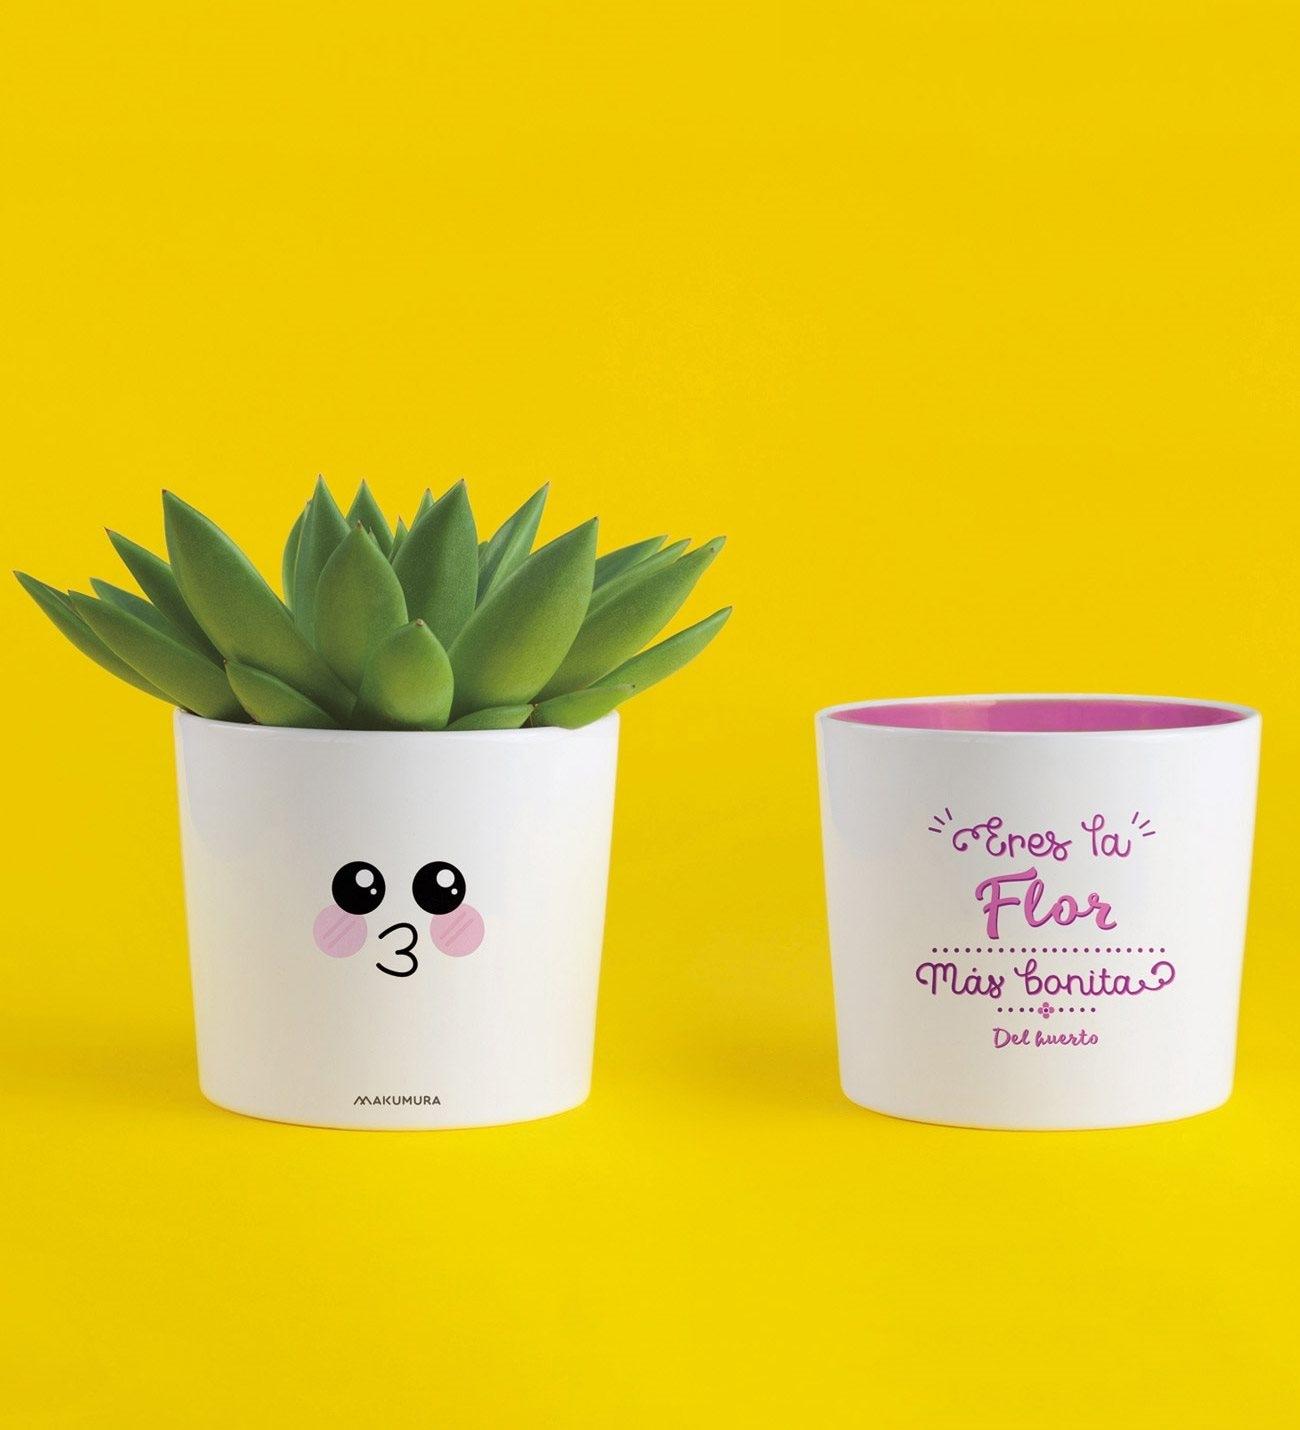 flor-mas-bonita -del-huerto-ceramic-flowerpot-gbmaku109-1-8d5f3ef40a14cde-c2a9c6bb.jpg